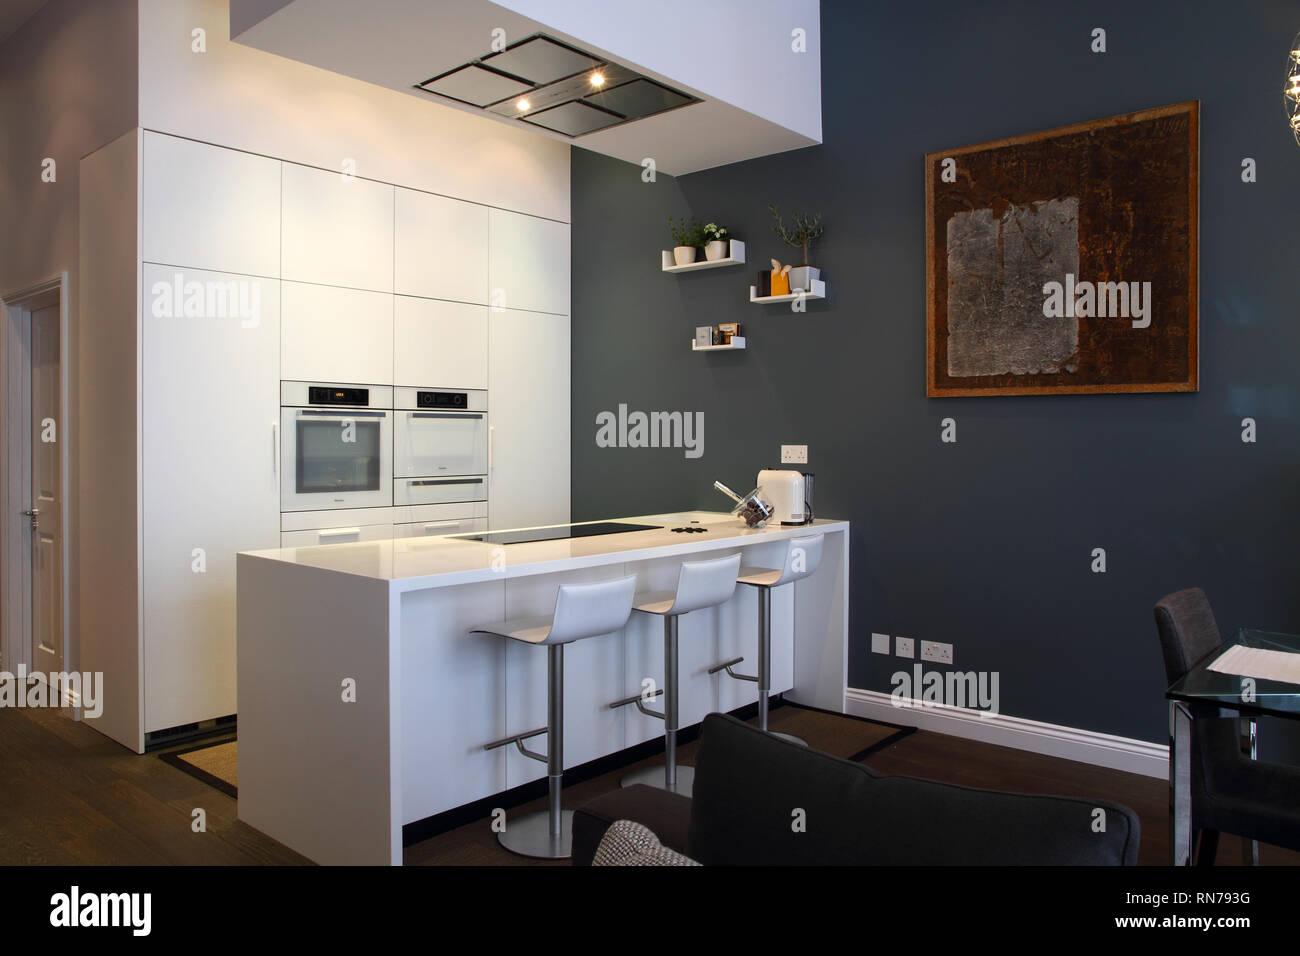 London apartment kitchen diner living room